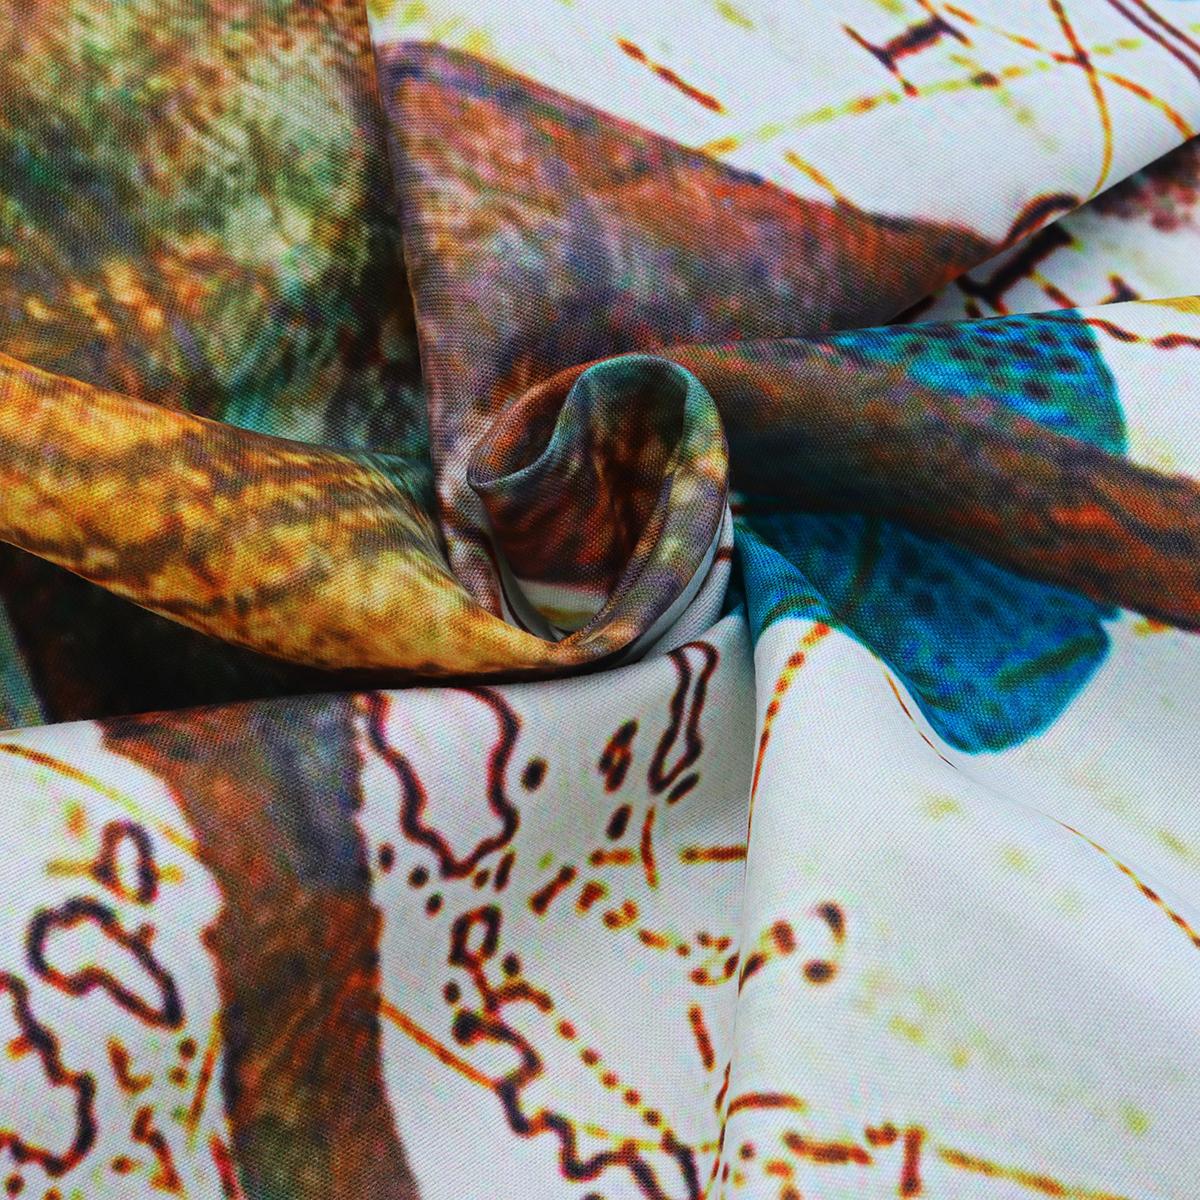 РетроОкеанМорскихЖивотныхГобеленМандала Хиппи Висит Декор Покрывало - фото 9